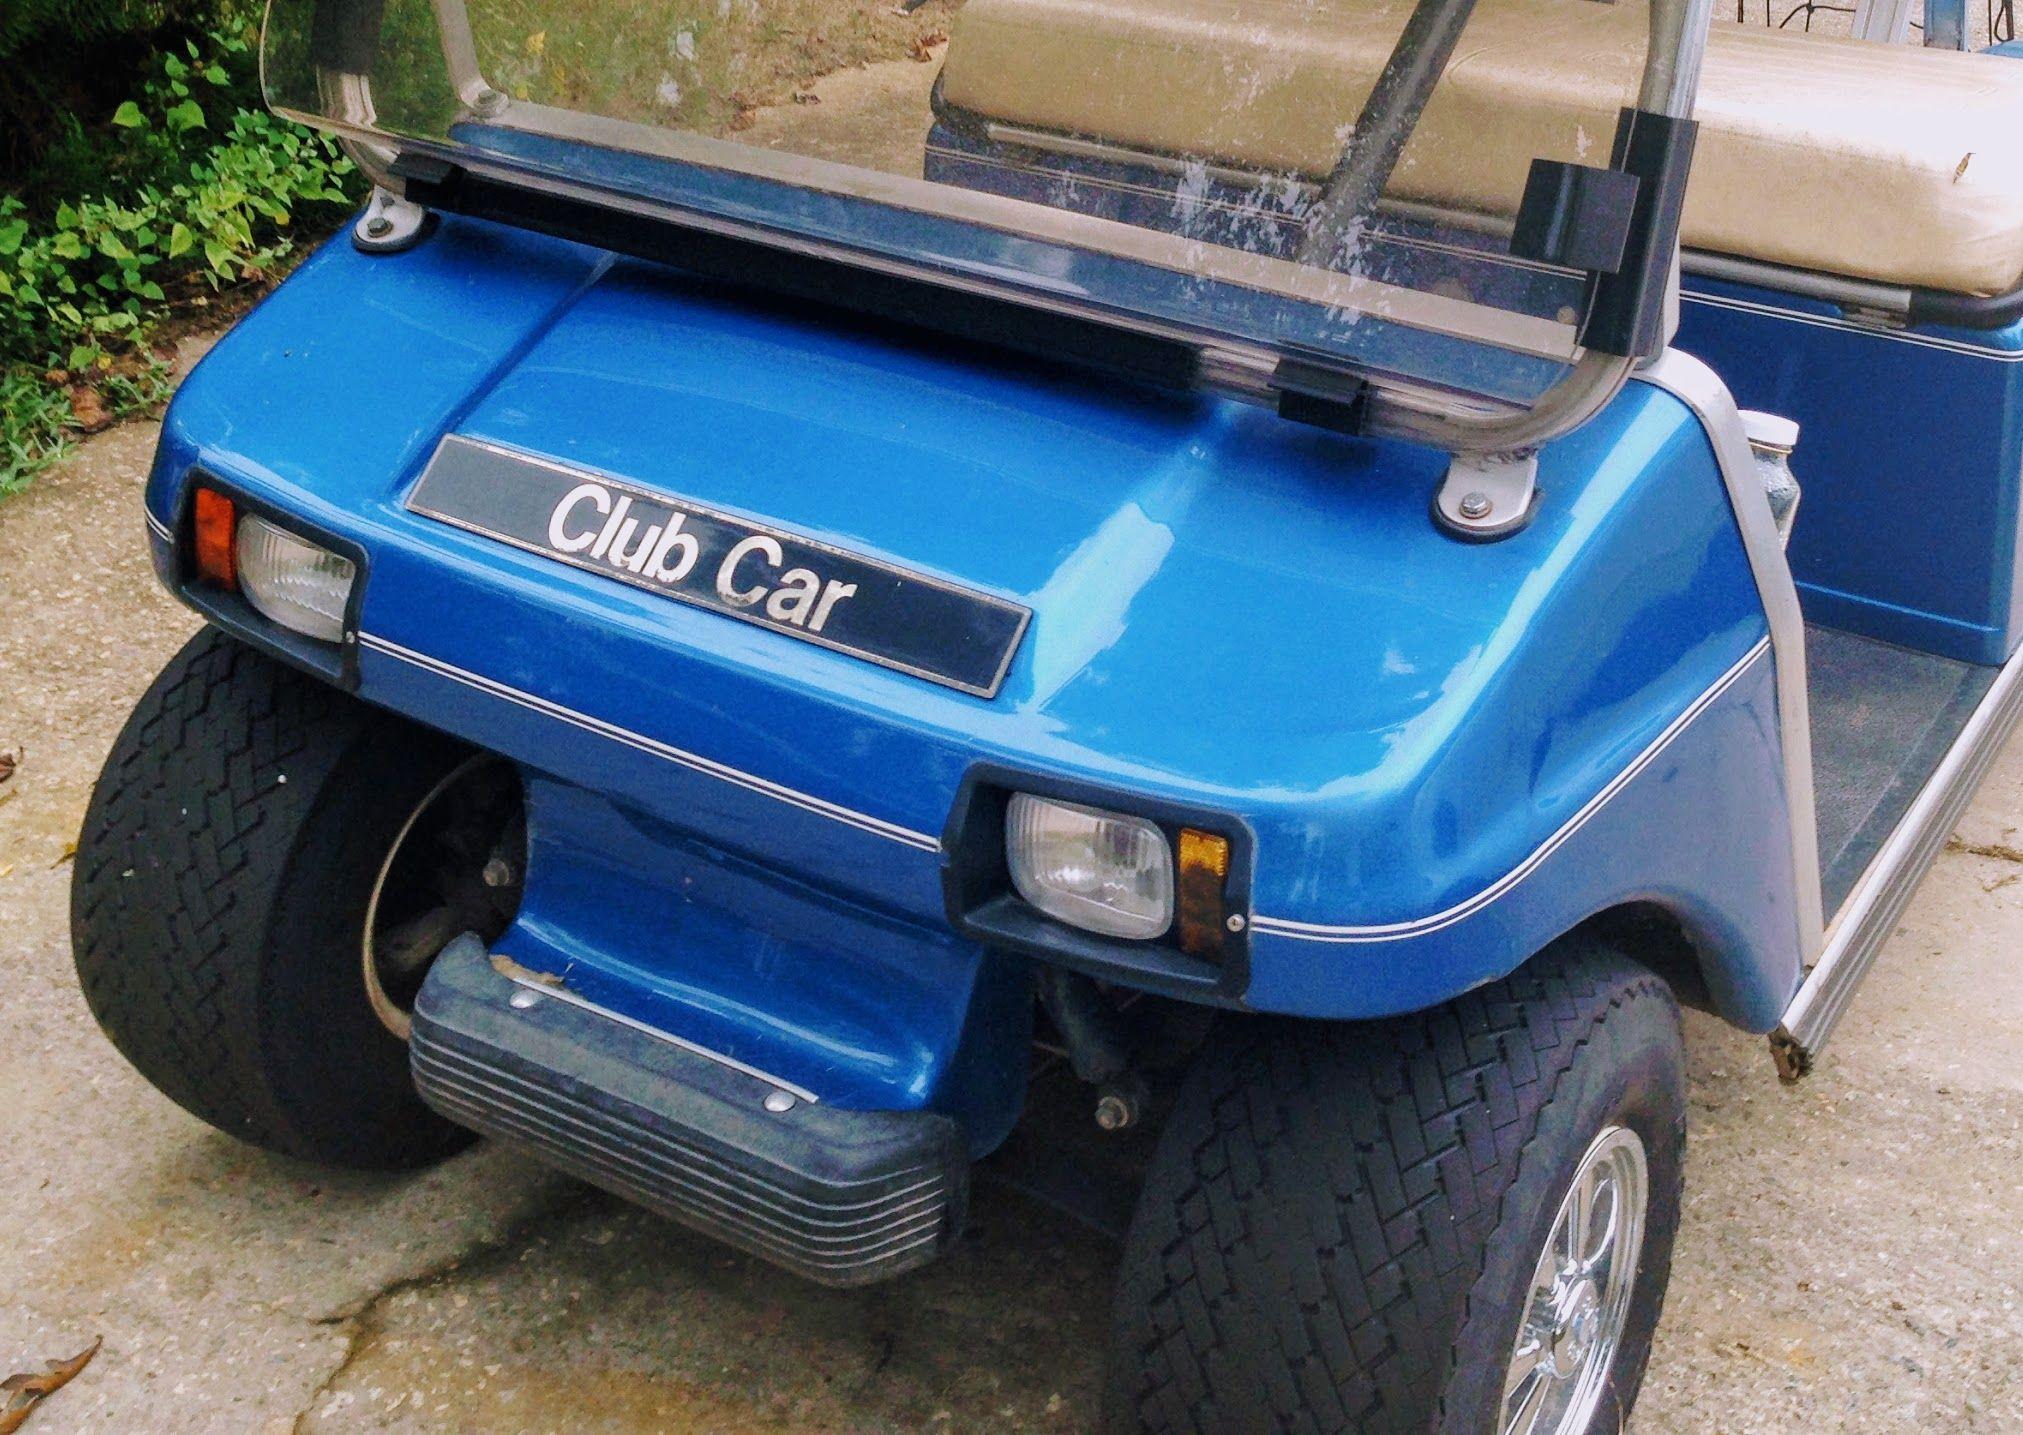 Club Car Golf Carts You Guide To Club Car Ownership Golf Carts Club Car Golf Cart Electric Golf Cart